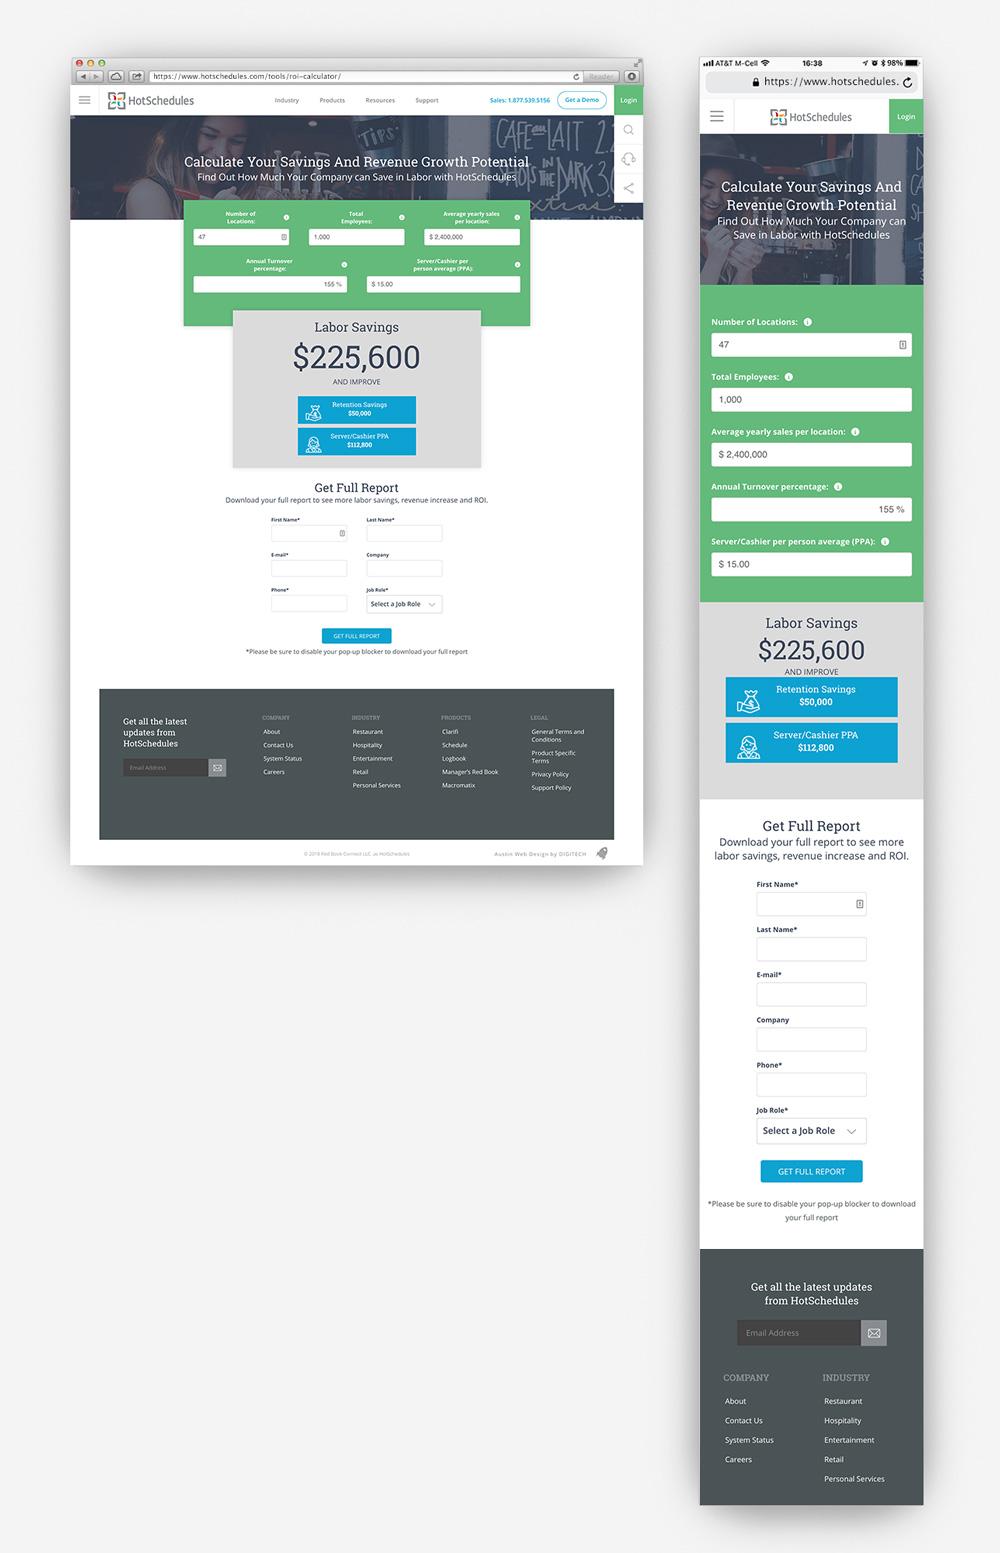 HotSchedules_ROI_Calculator_Responsive_Design_by_Julie_Mendez1